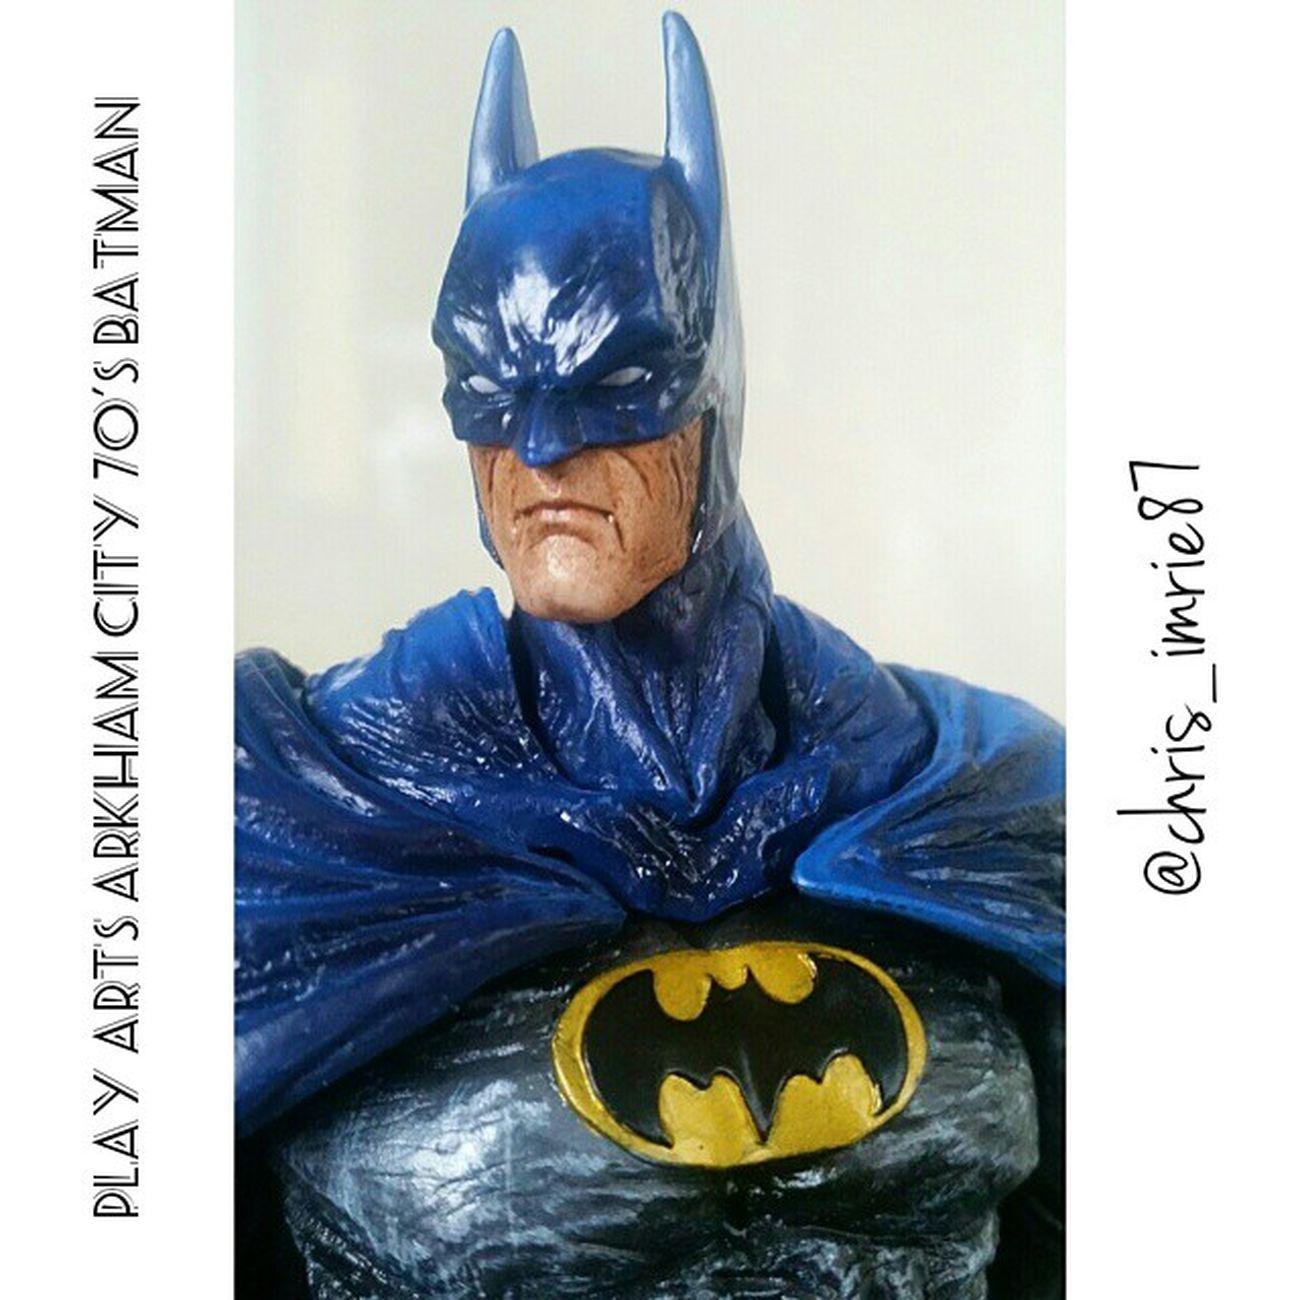 CultOfTheBatman Thebatforce BatGeek Geek GeekandProud Darkknight CapedCrusader DC Batman BatmanCollection Dccomics Dcuniverse DetectiveComics Playarts Playartskai Squareenix 70sBatman ArkhamCity Rocksteady Mancave ArkhamKnight